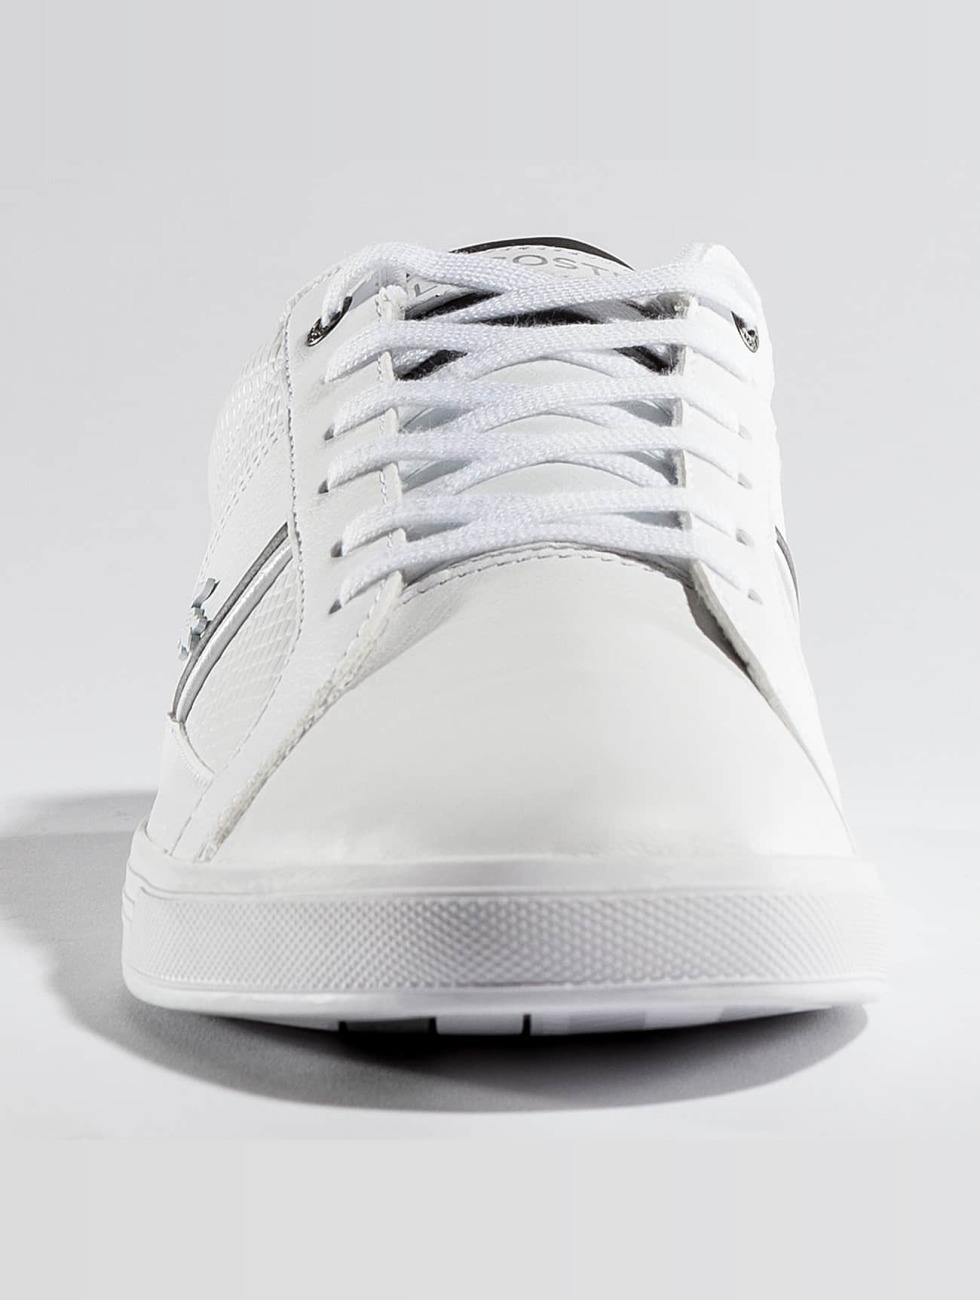 Outlet Classic Discount Erg Goedkoop Lacoste schoen / sneaker Europa 417 SPM in wit 336322 Outlet Eastbay Kopen Goedkope Uitstekend Klaring Buy yh8KnCK